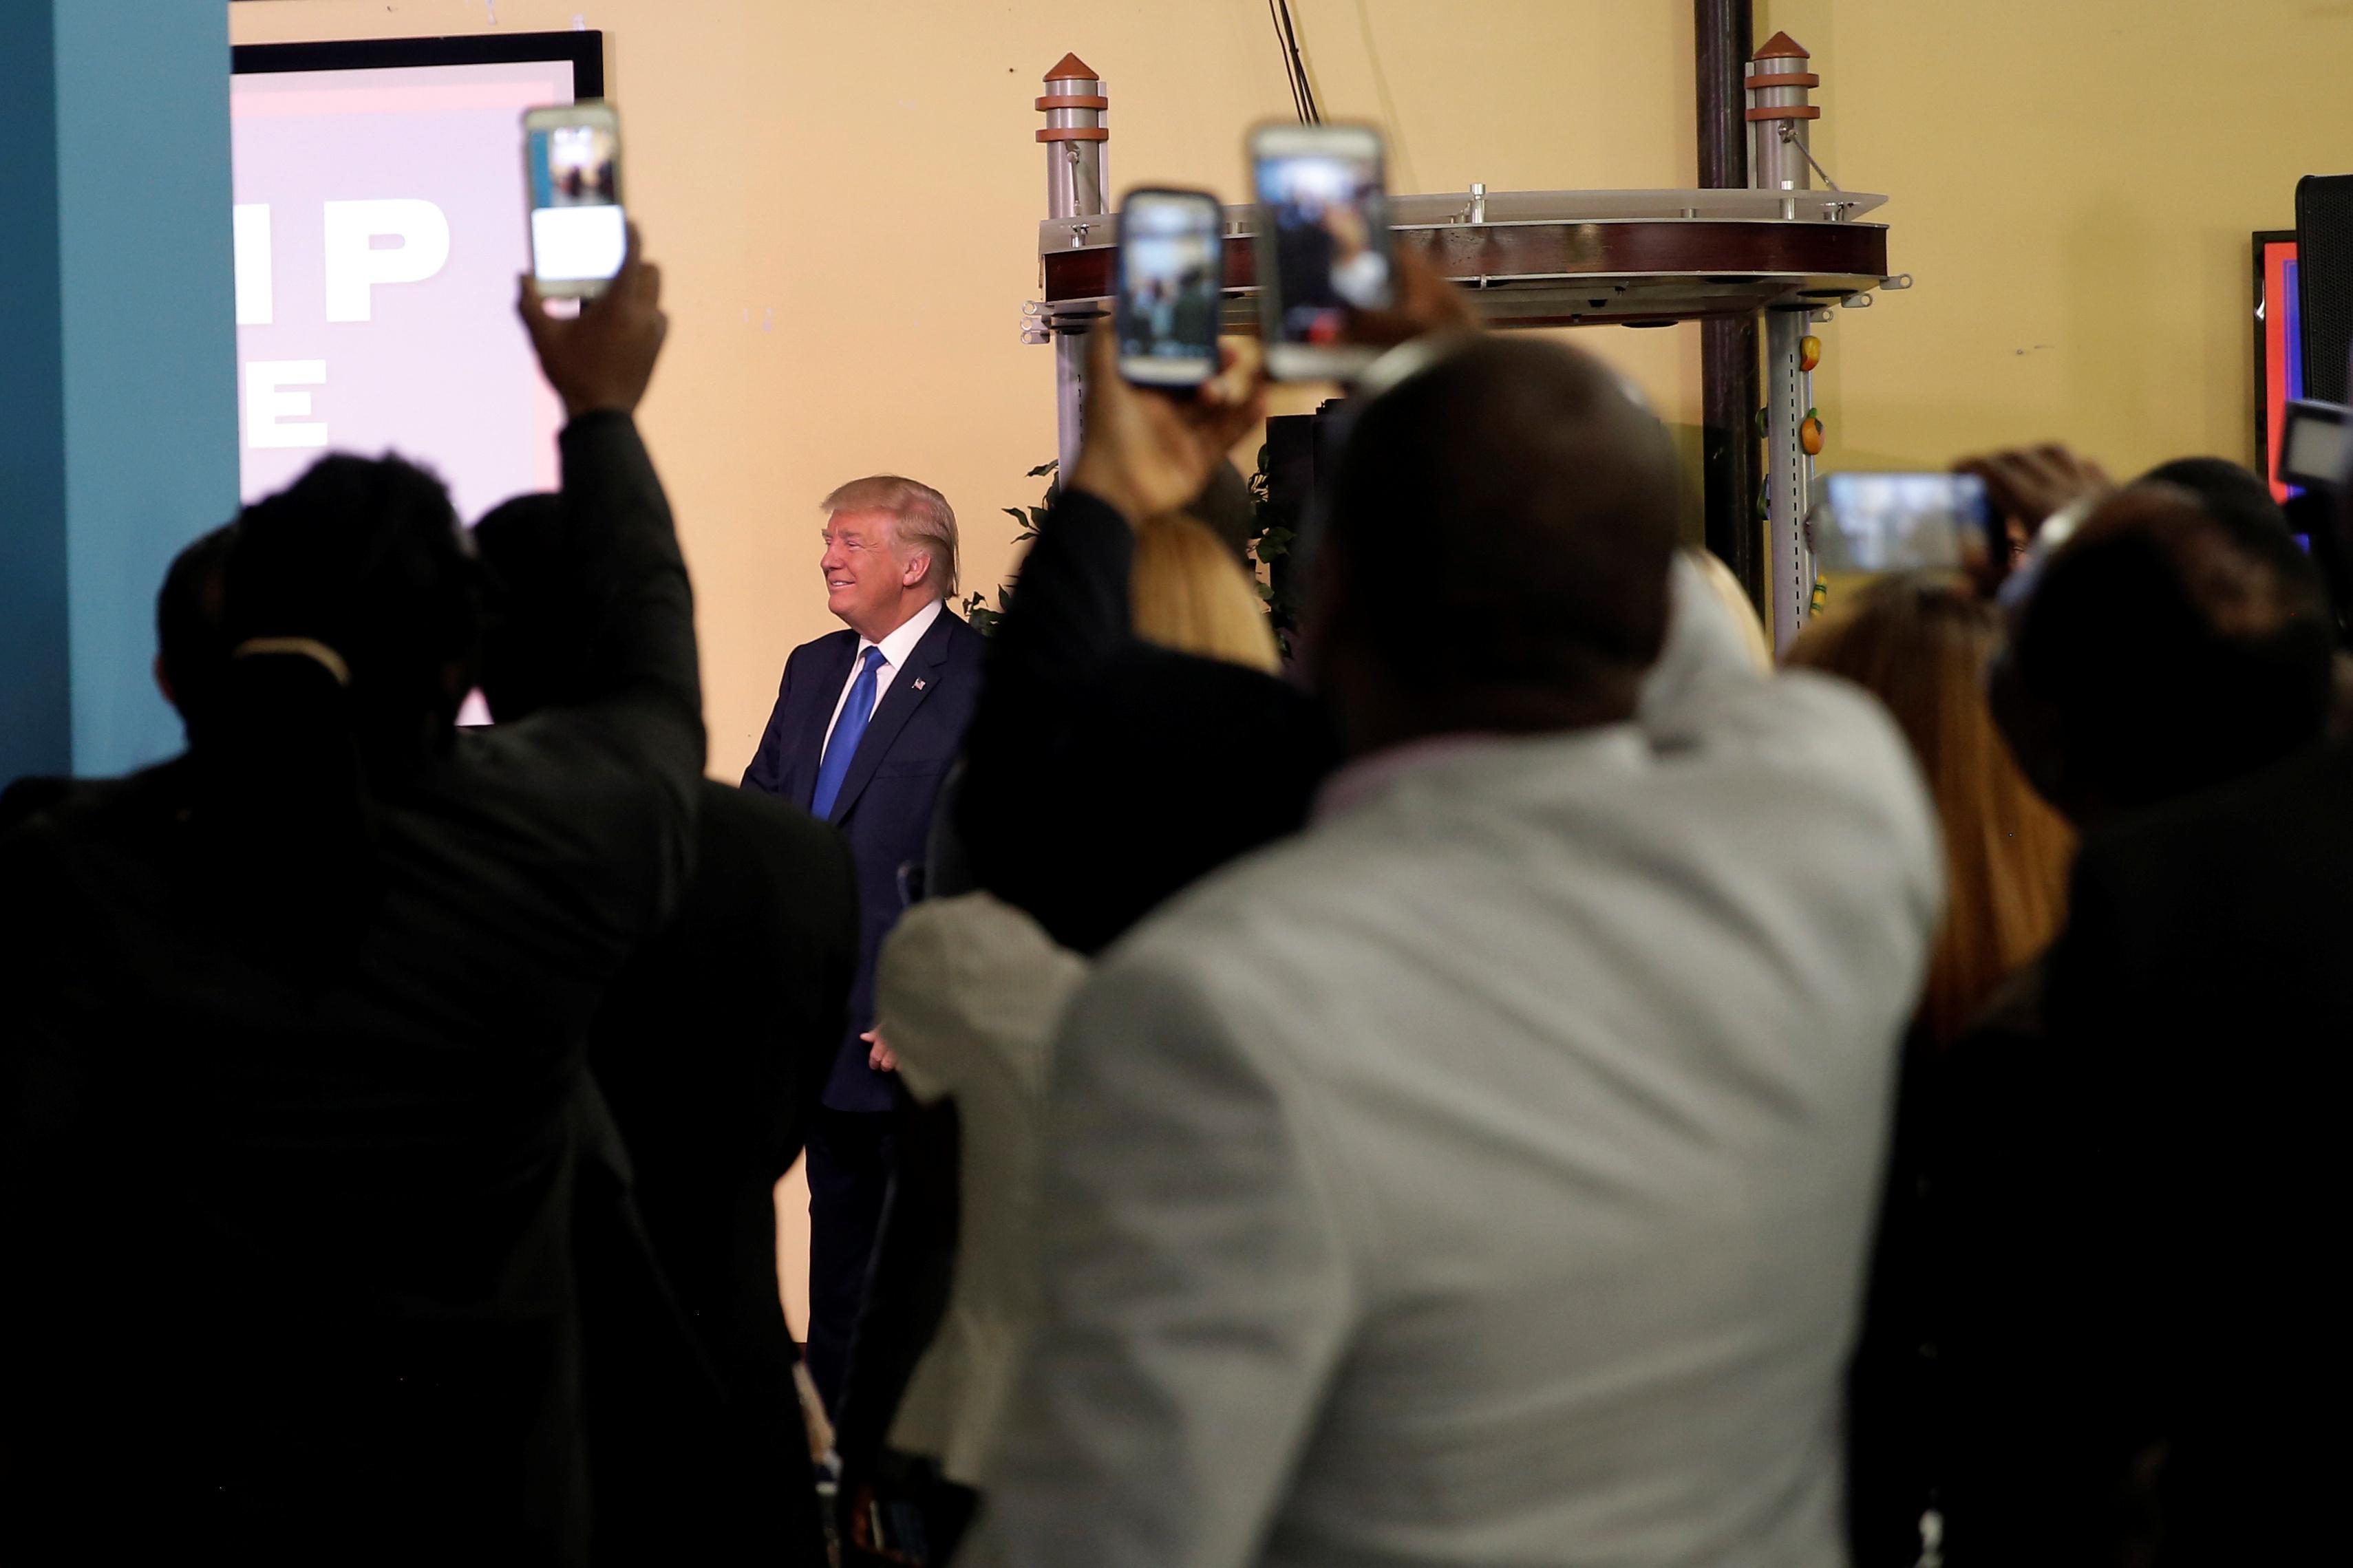 Republican presidential nominee Donald Trump makes a campaign visit to the Little Haiti Cultural Center in Miami